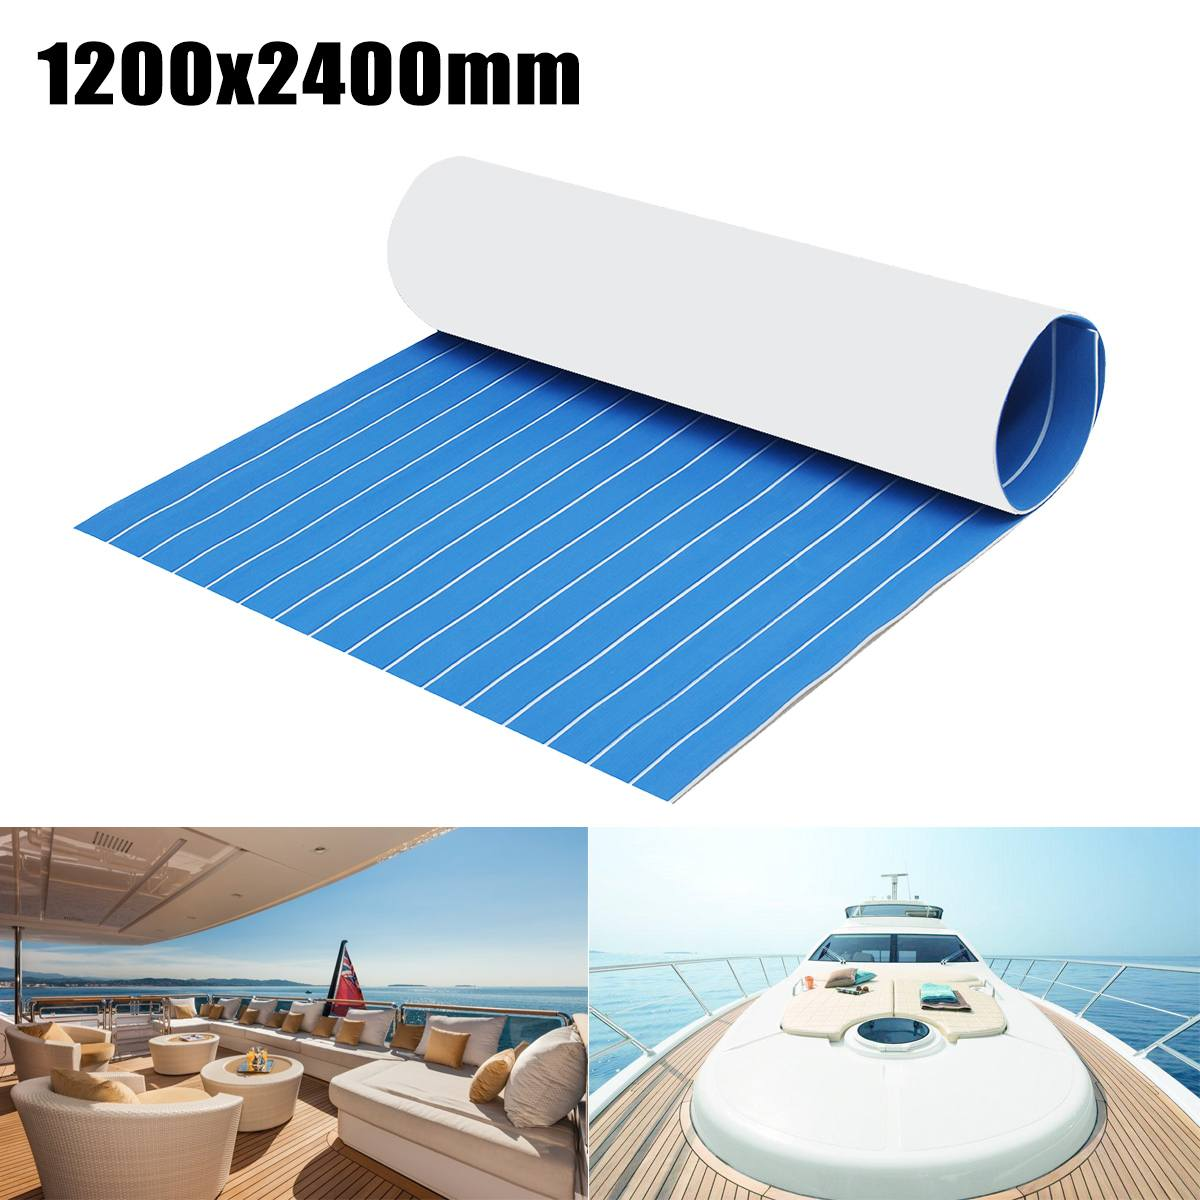 1200x2400mm 5mm/6mm Self-Adhesive Foam Teak Decking EVA Foam Marine Flooring Faux Boat Deck Sheet Accessories Marine Blue White